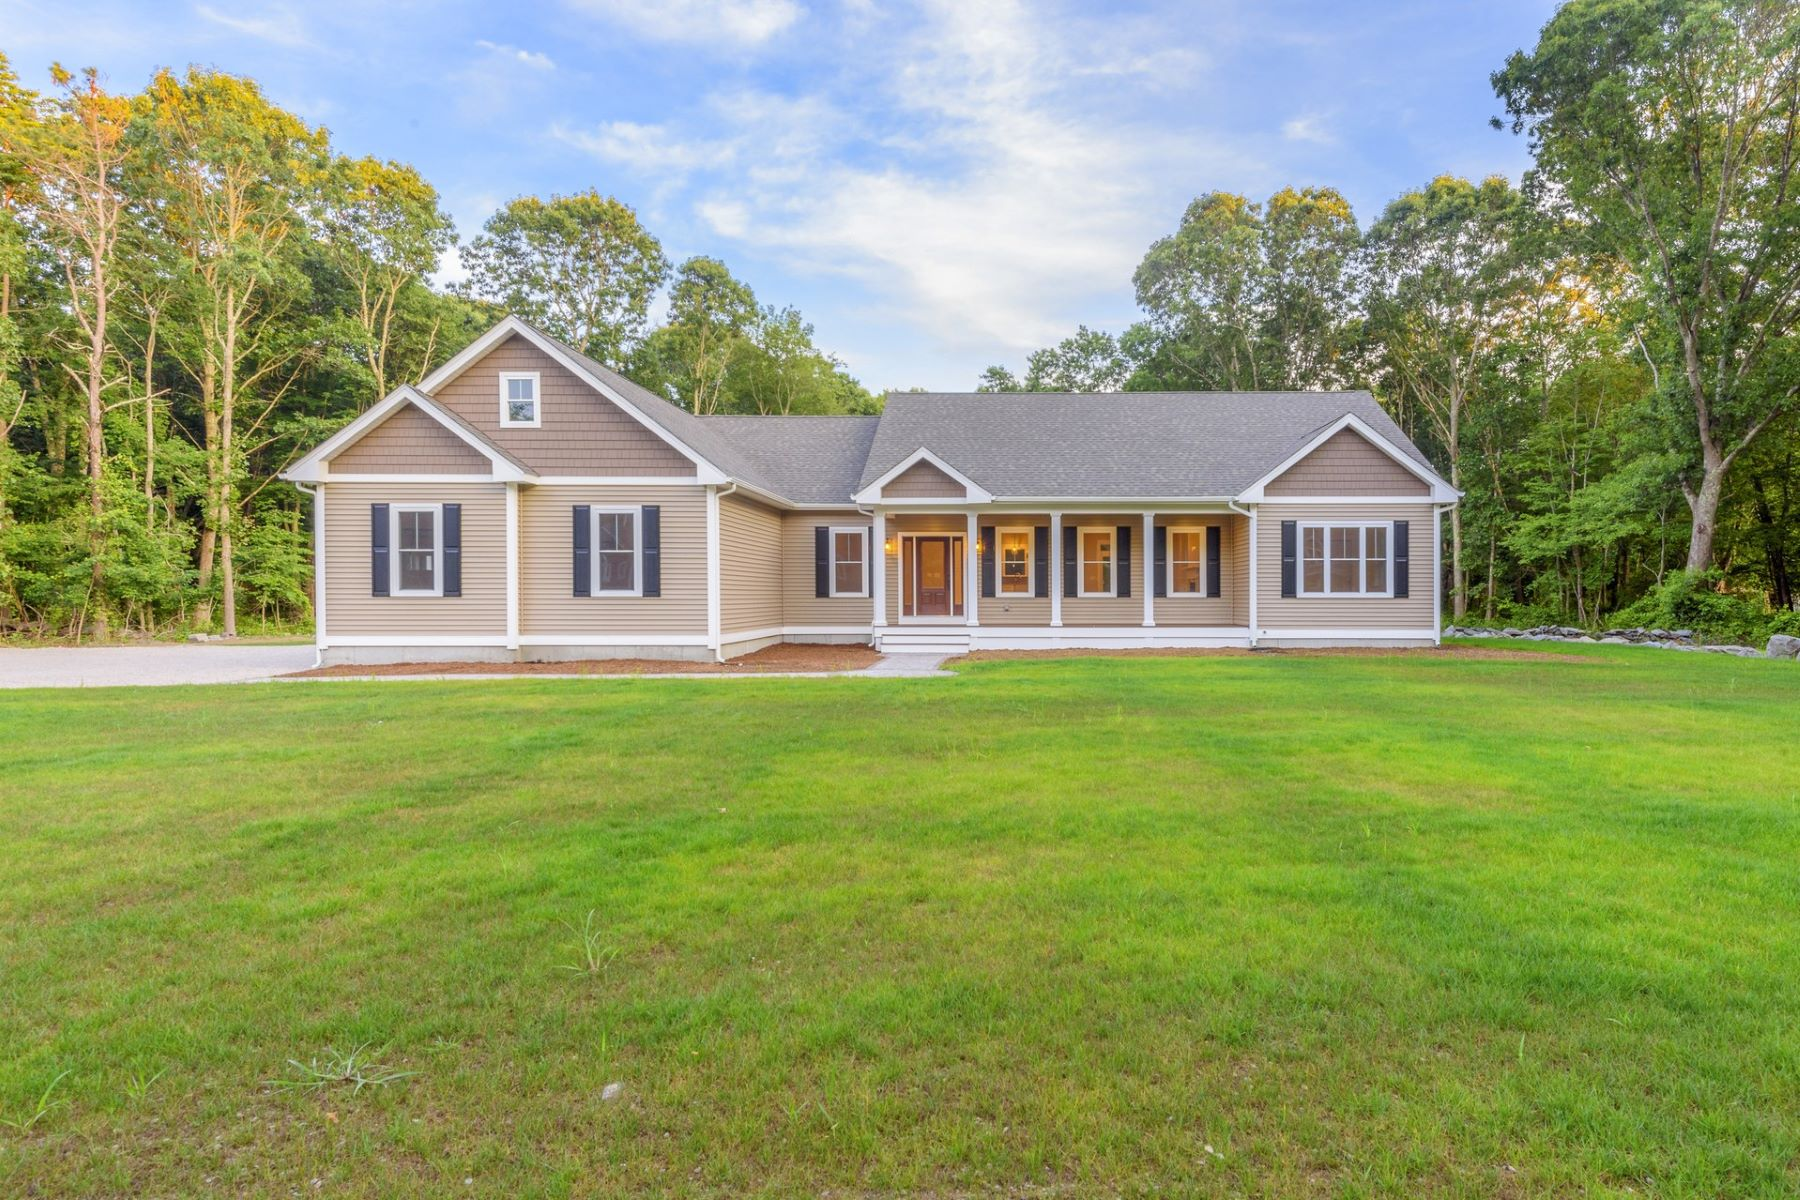 Single Family Homes για την Πώληση στο 00 Kirby Av., Warwick, RI Warwick, Ροουντ Αϊλαντ 02889 Ηνωμένες Πολιτείες